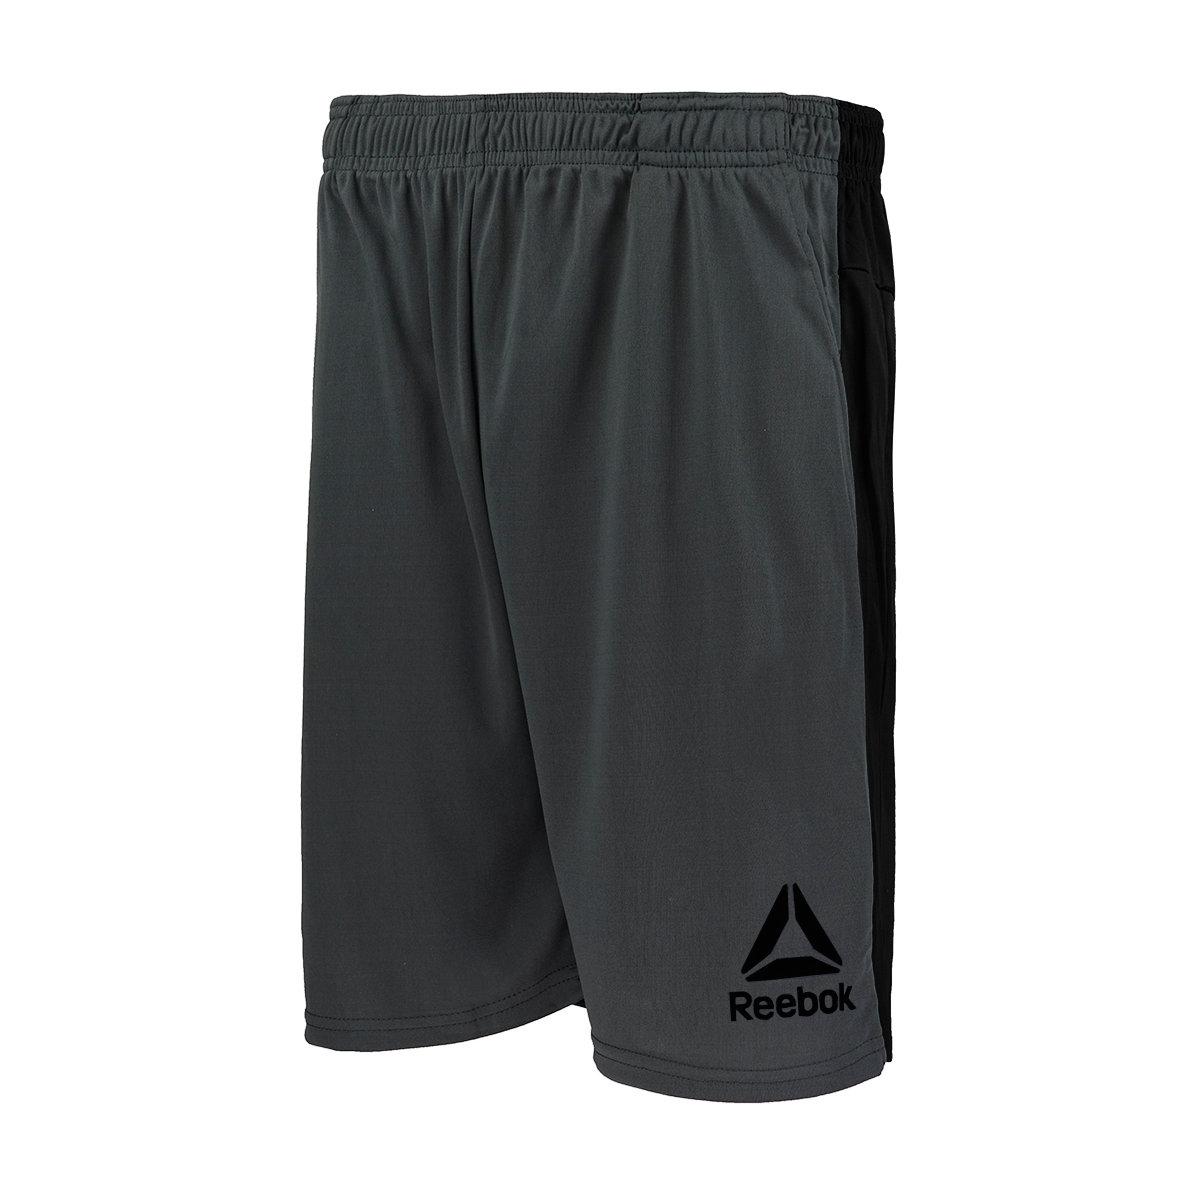 Reebok Men's Contrast Shorts - $10 AC + Free Shipping